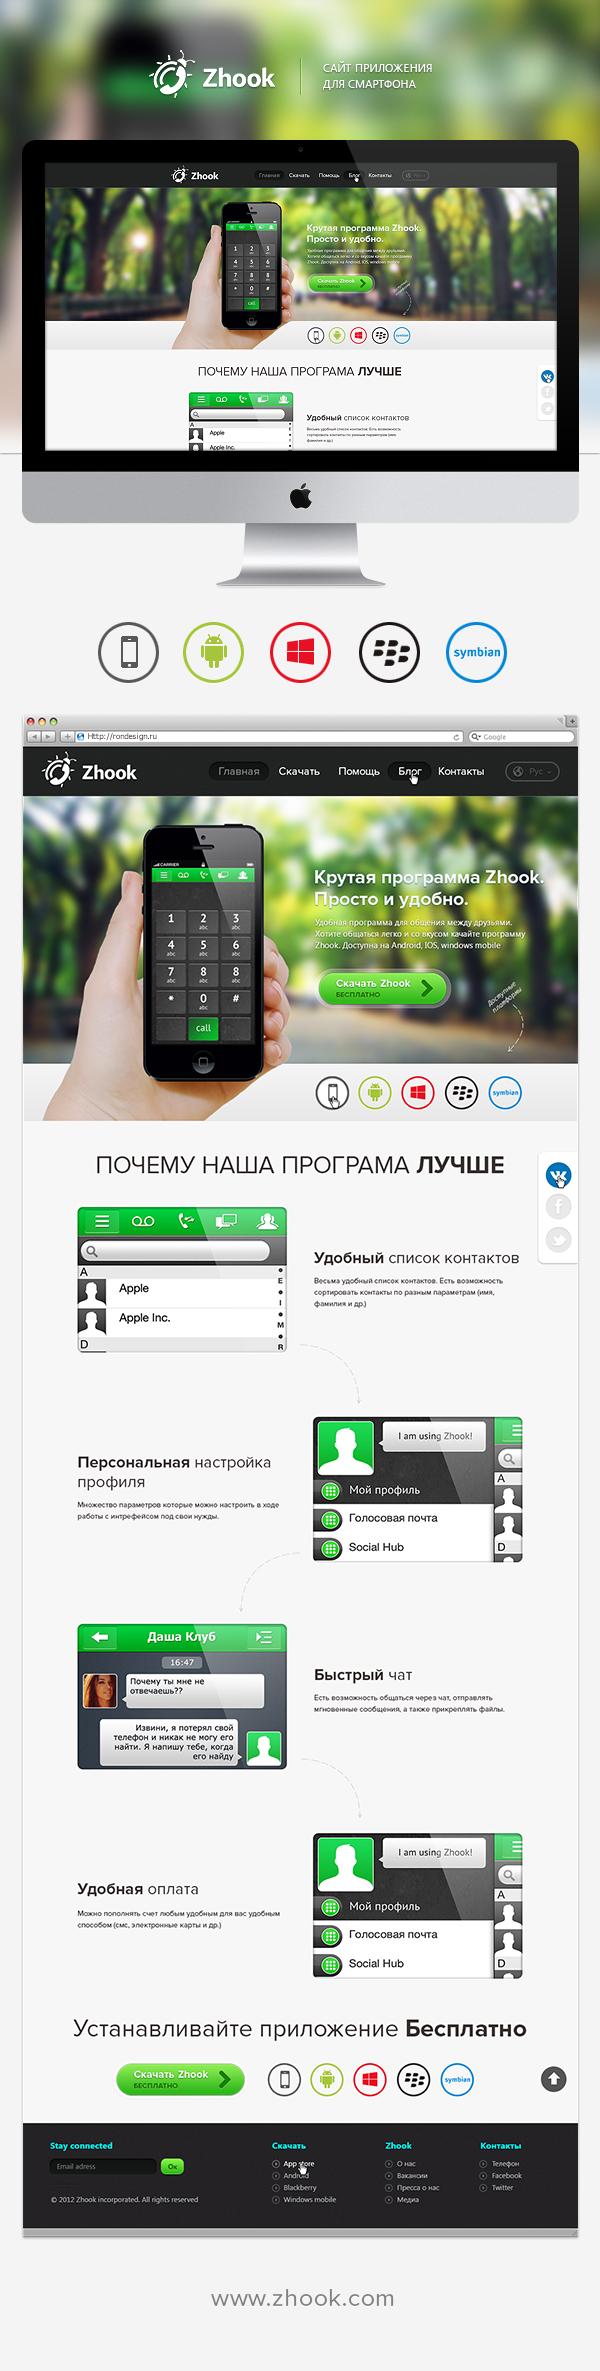 iphone android Windows 8 BlacBerry Symbian app UI Web landing zhoook